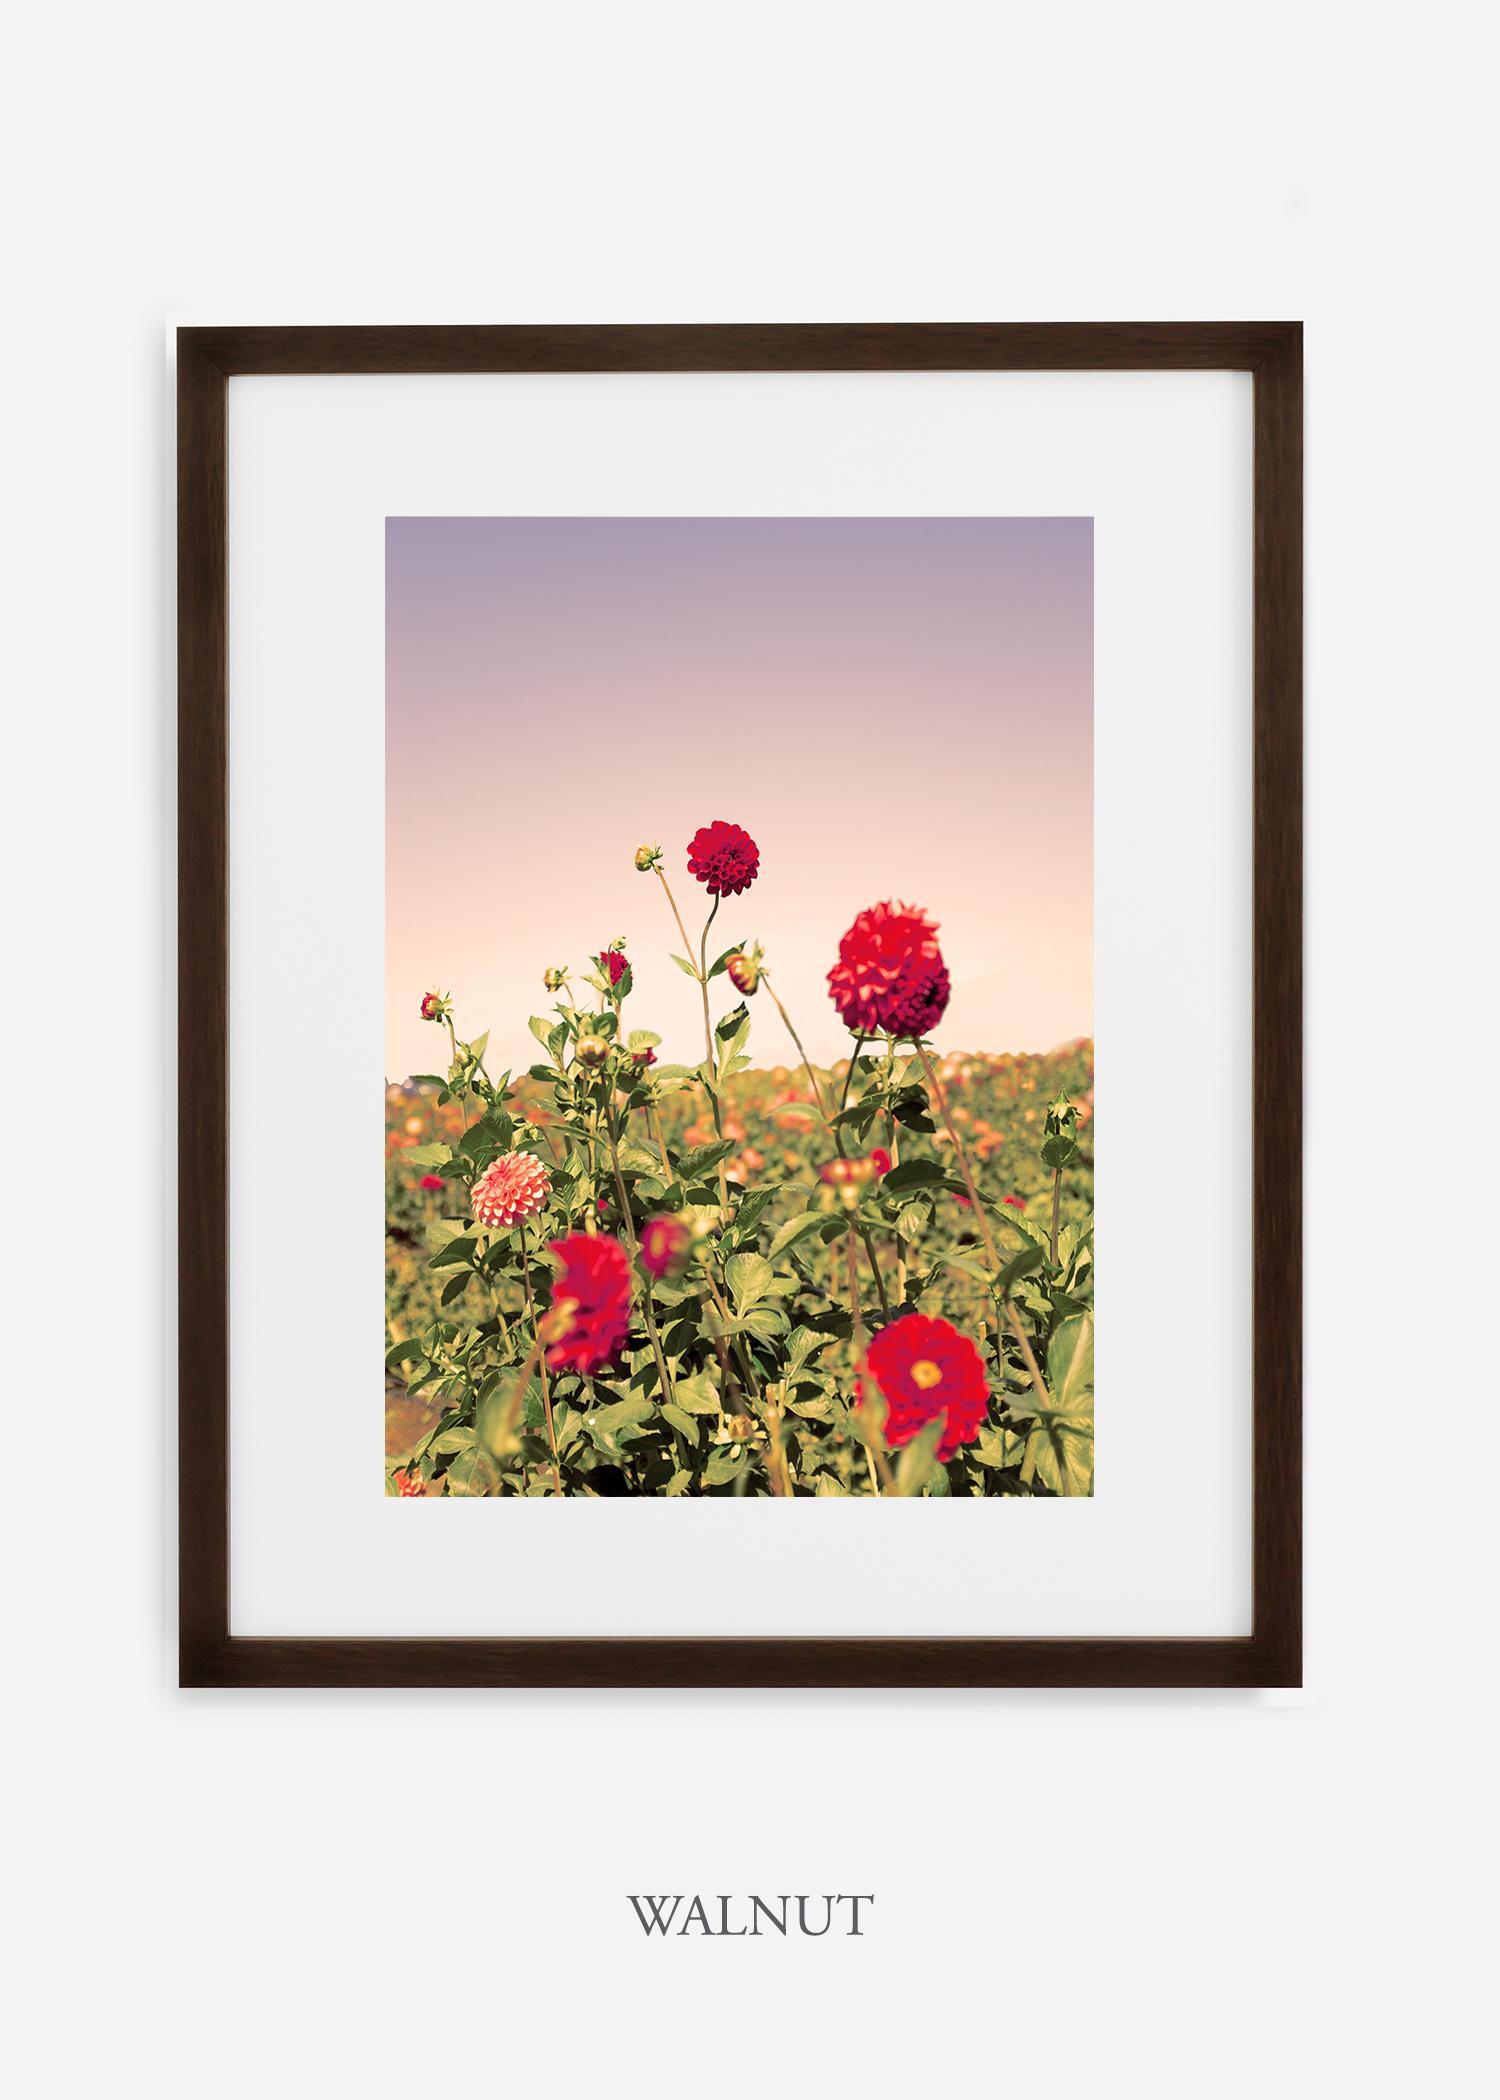 DahliaNo.8-walnut-frame-mat-interior-design-botanical-print-art-wilder-california-wilder-paper.jpg